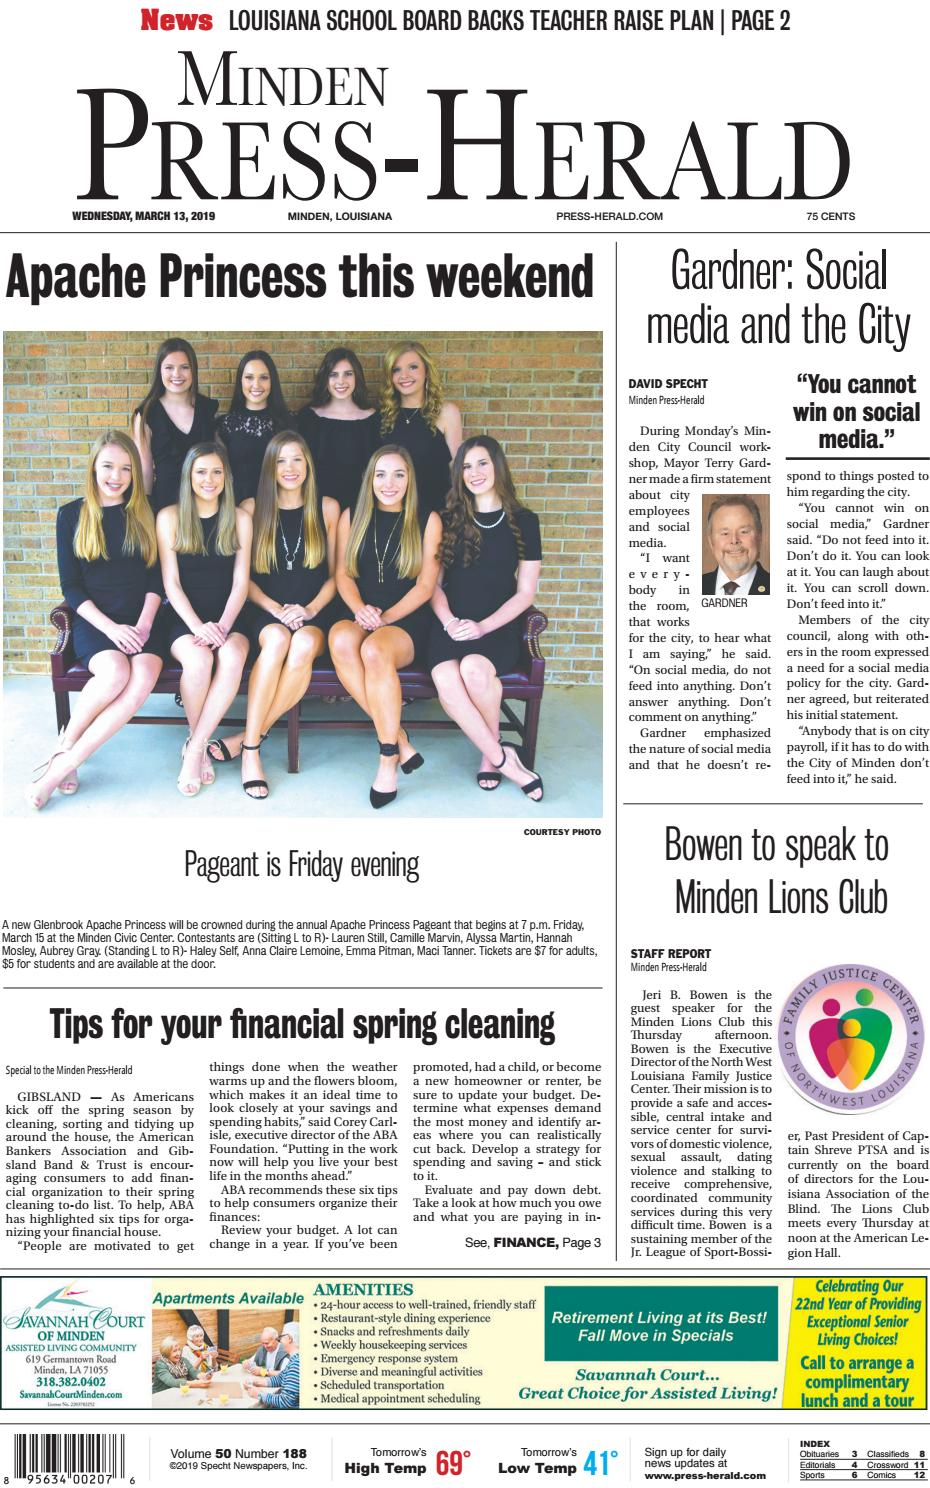 03-13-2019 Minden Press-Herald e-Edition by Minden Press